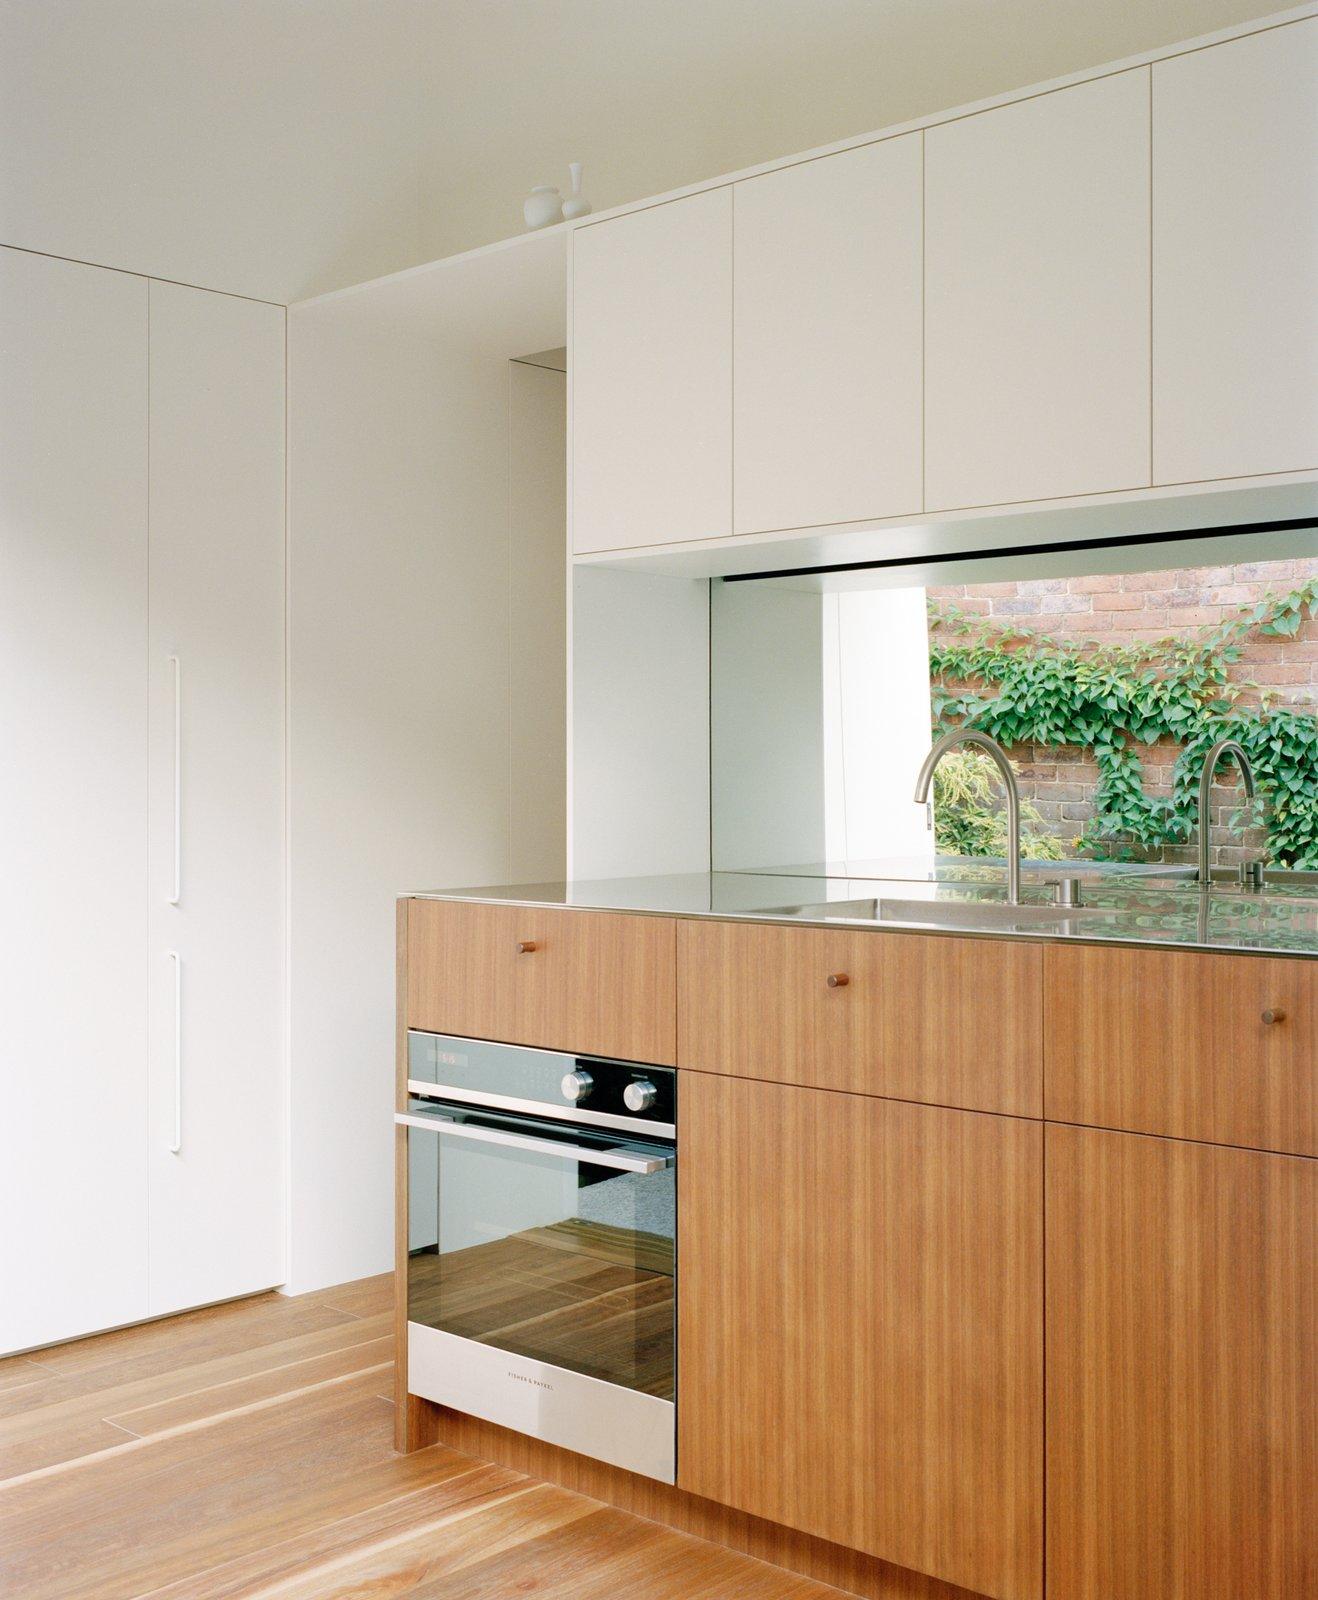 Kitchen of JJ House by Bokey Grant